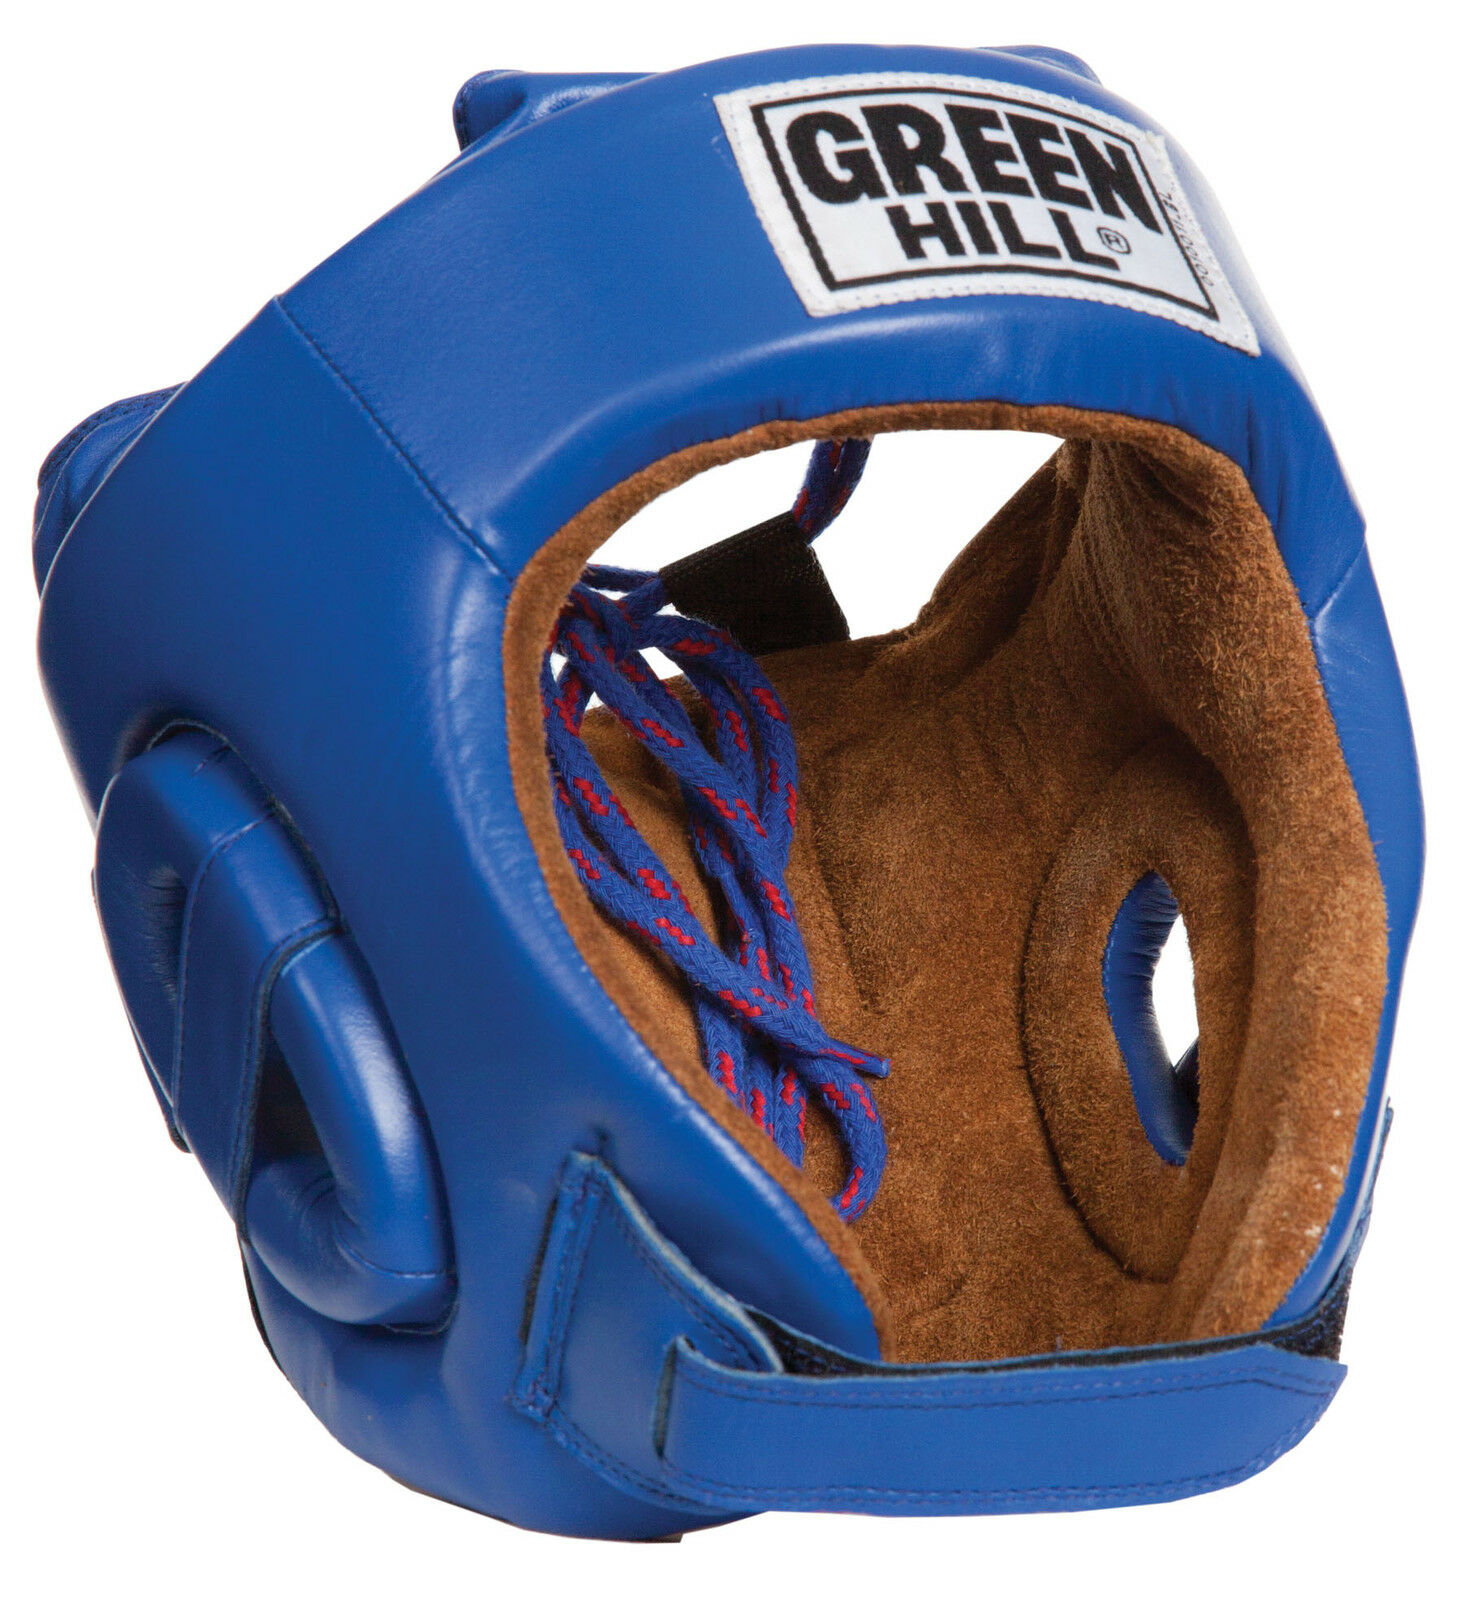 Grünhill boxen fünf kopf guard fünf boxen sterne kuh rindsleder protective gang sicherheit a52f89